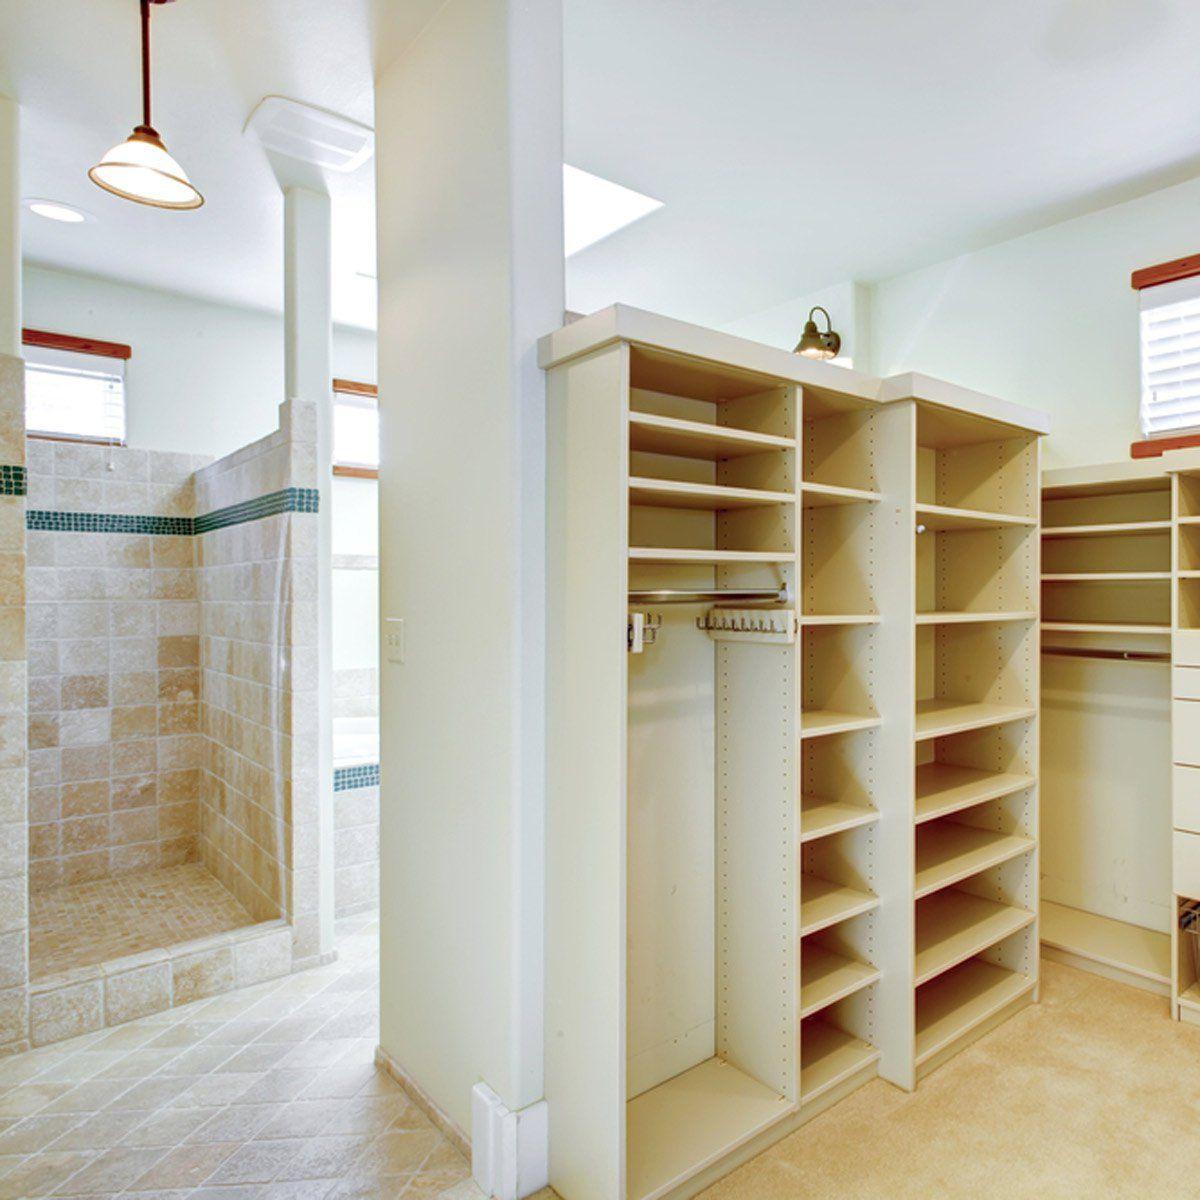 12 walkin closets to die for  custom closet shelving